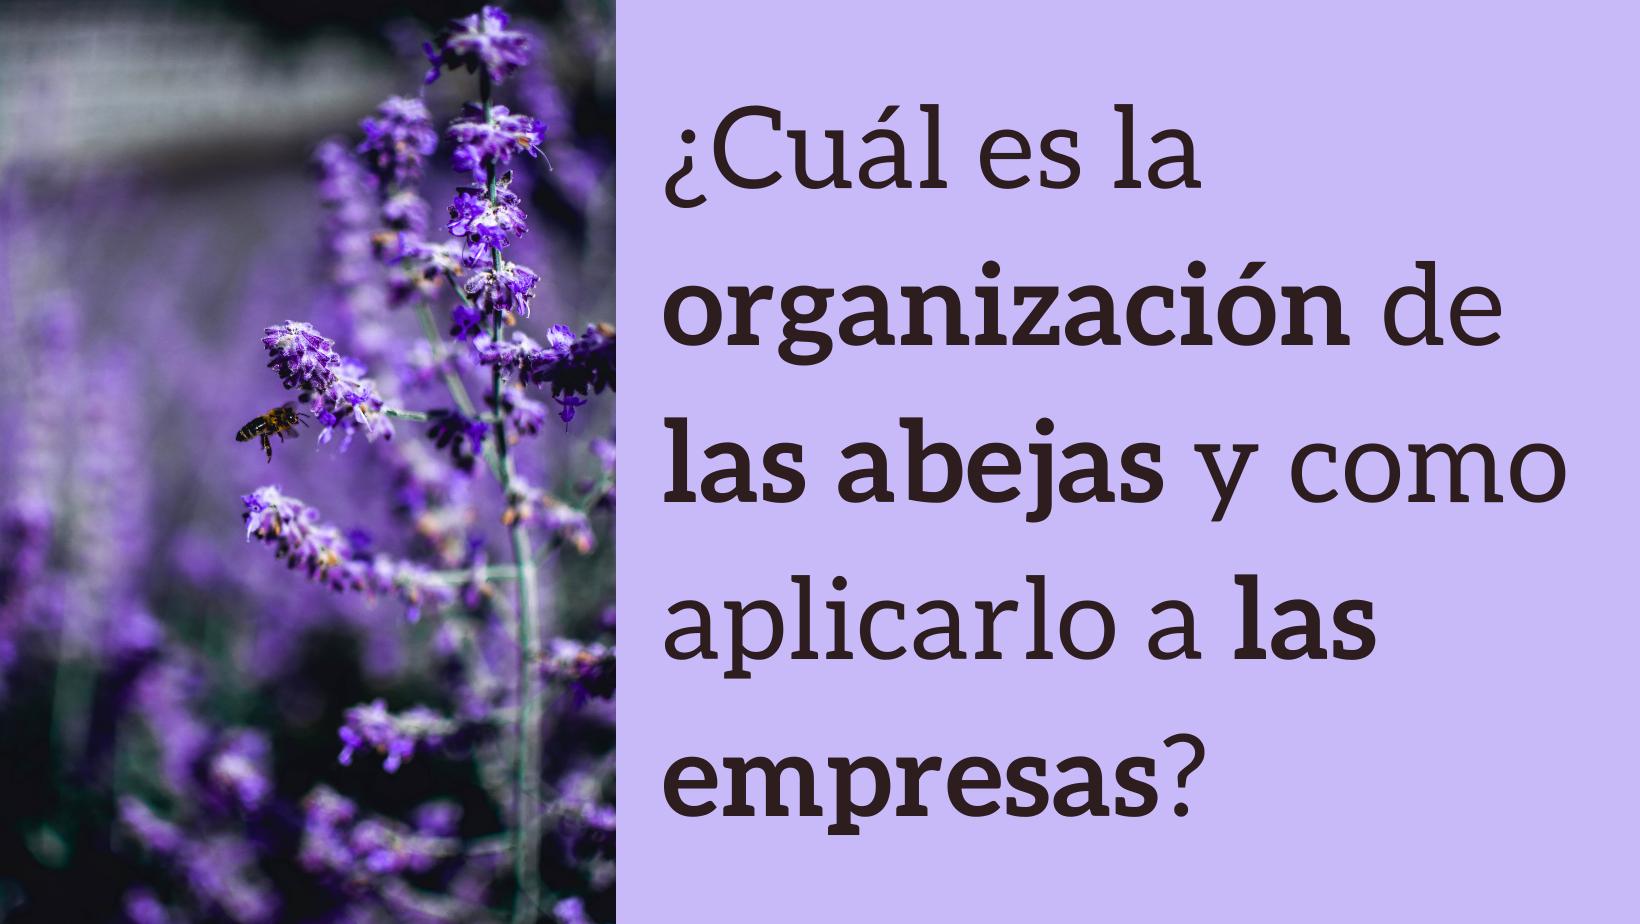 5d71e-organizacion-abejas-empresas-networking-bweb.png